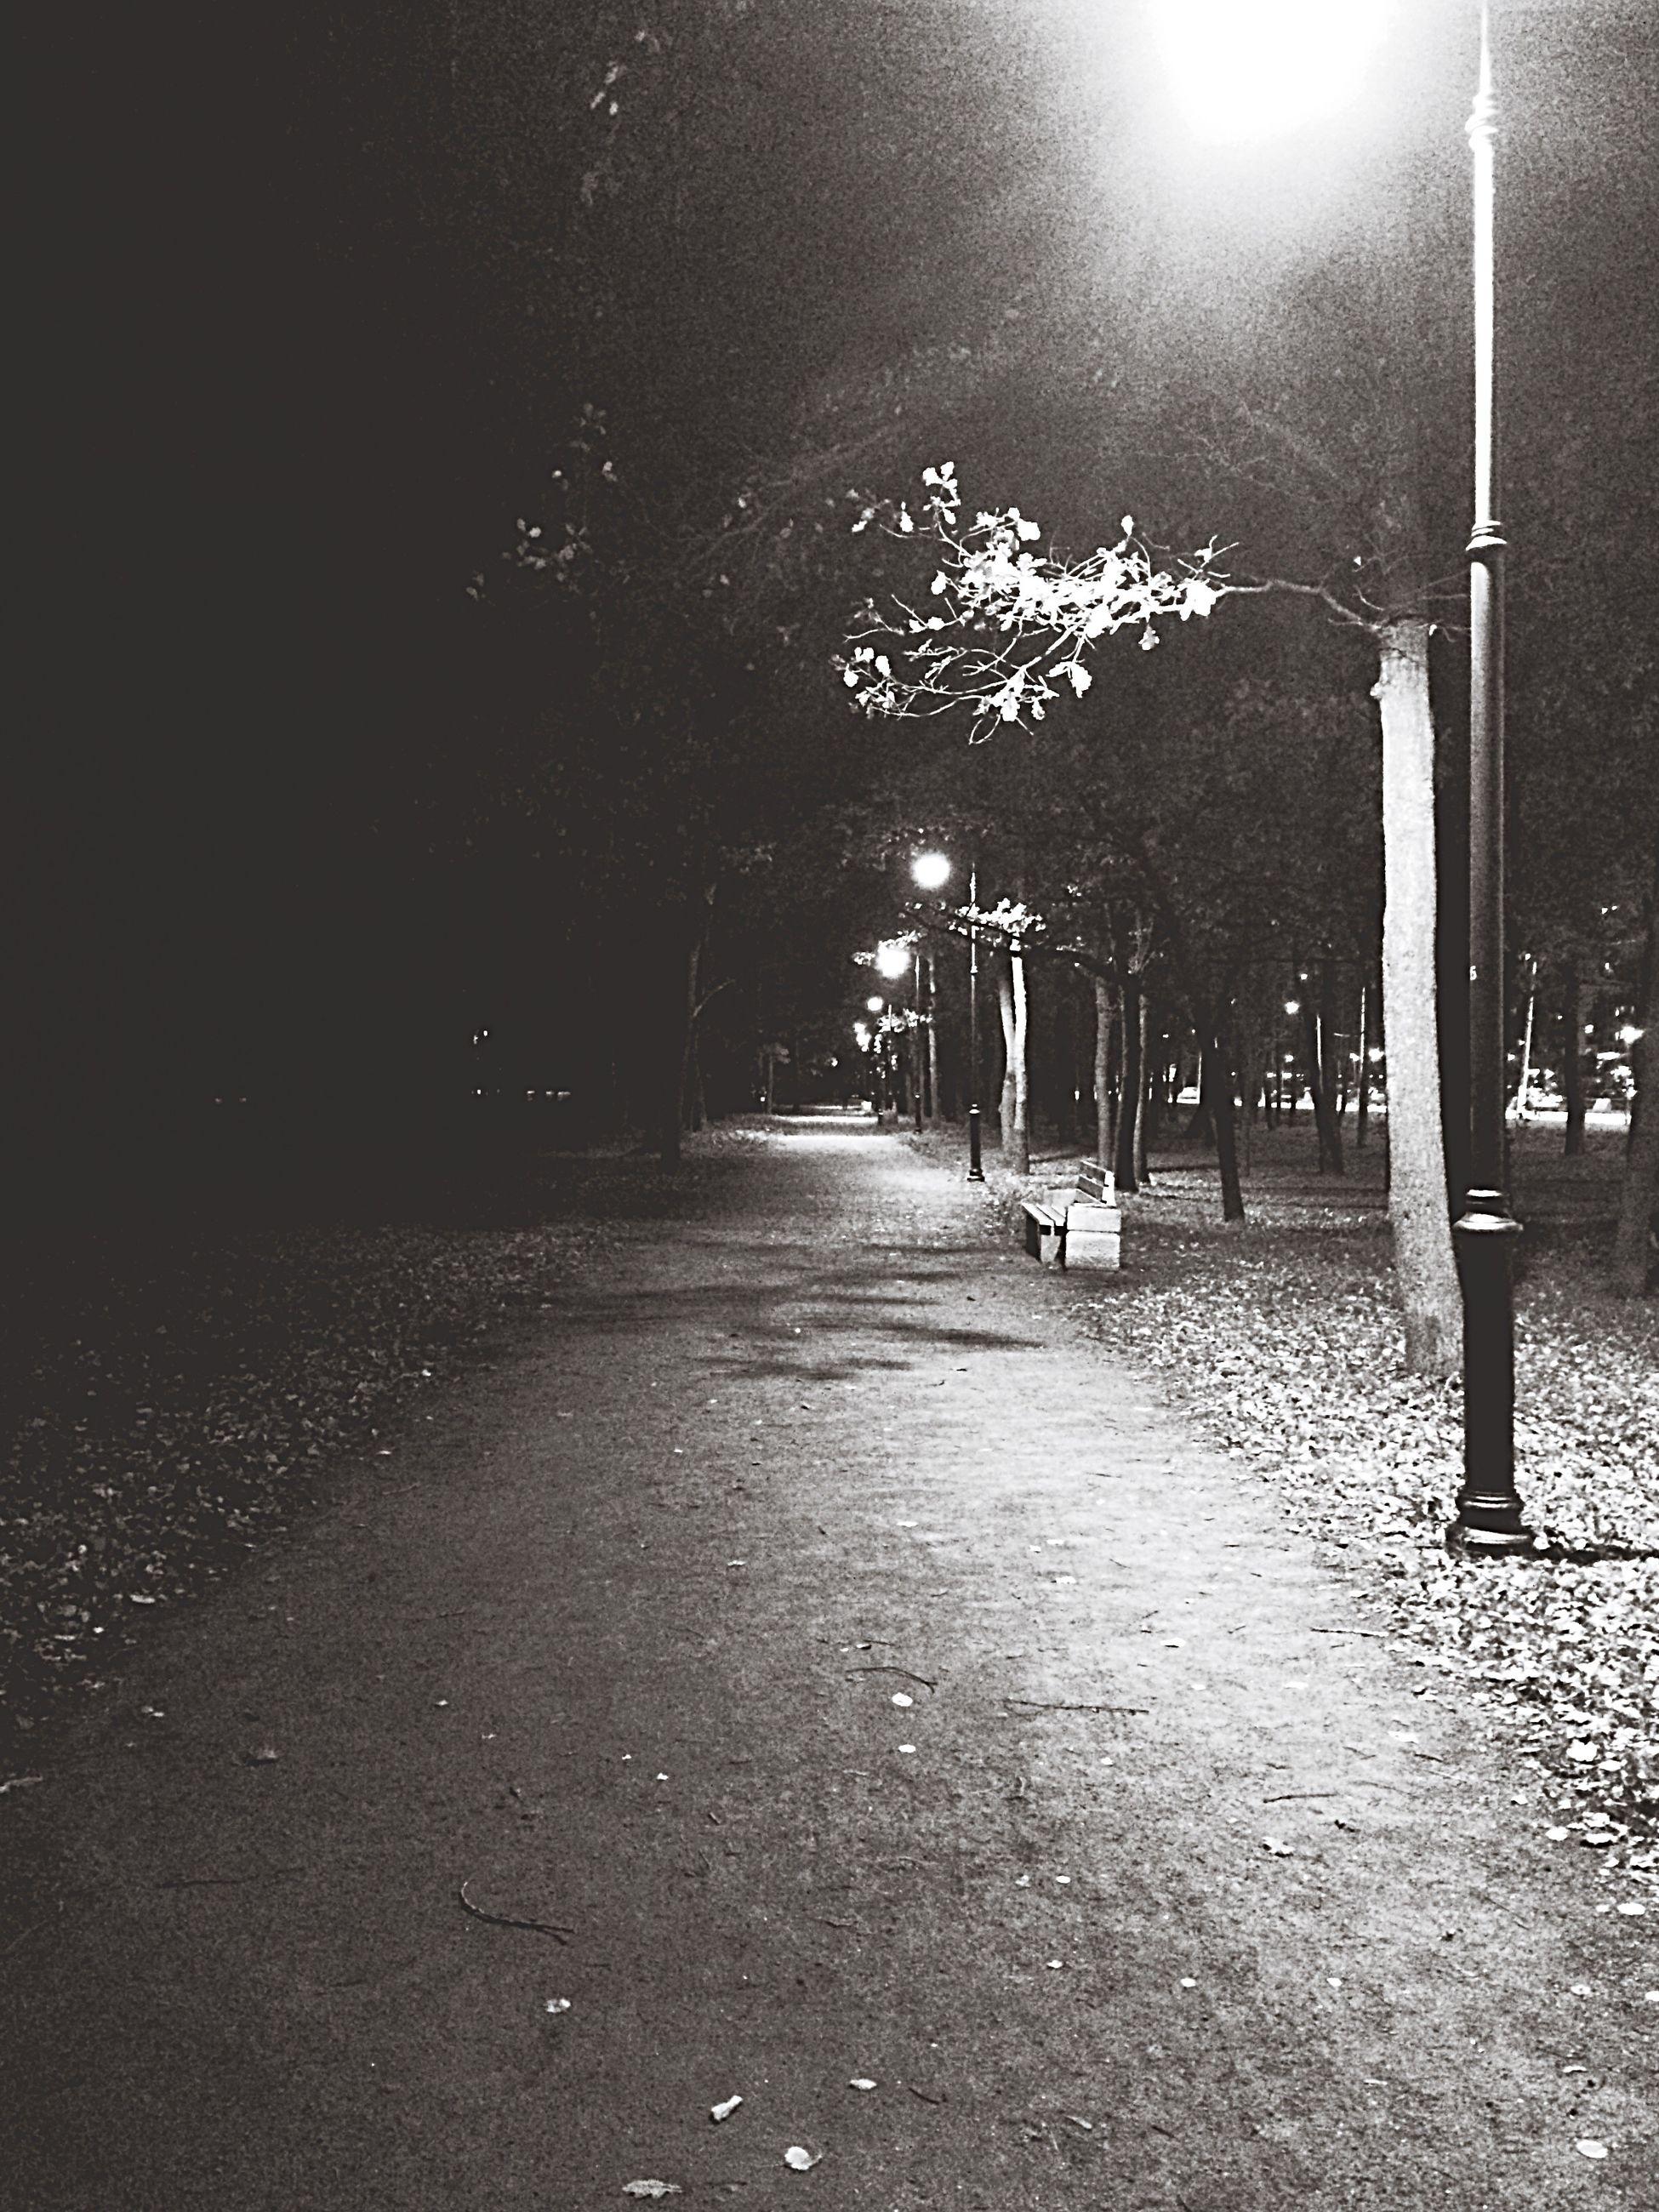 street light, night, illuminated, road, lighting equipment, street, the way forward, tree, electric light, dark, tranquil scene, diminishing perspective, outdoors, lit, tranquility, scenics, vanishing point, solitude, empty road, footpath